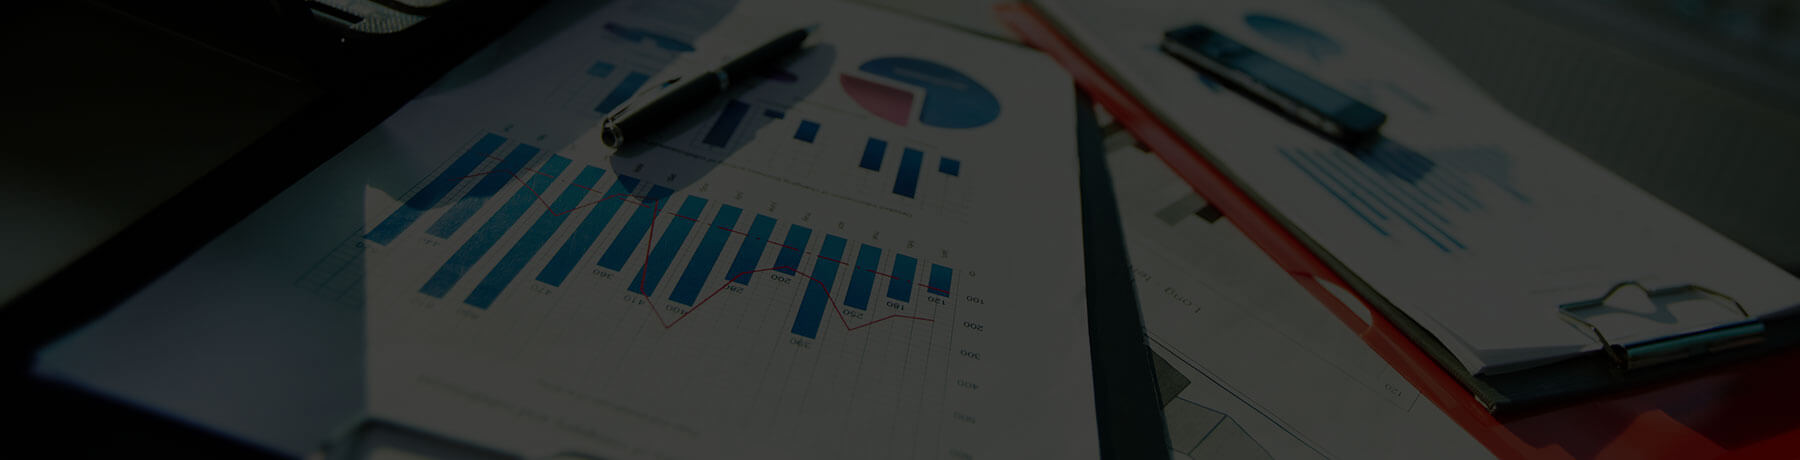 cusomter-loyalty-analytics